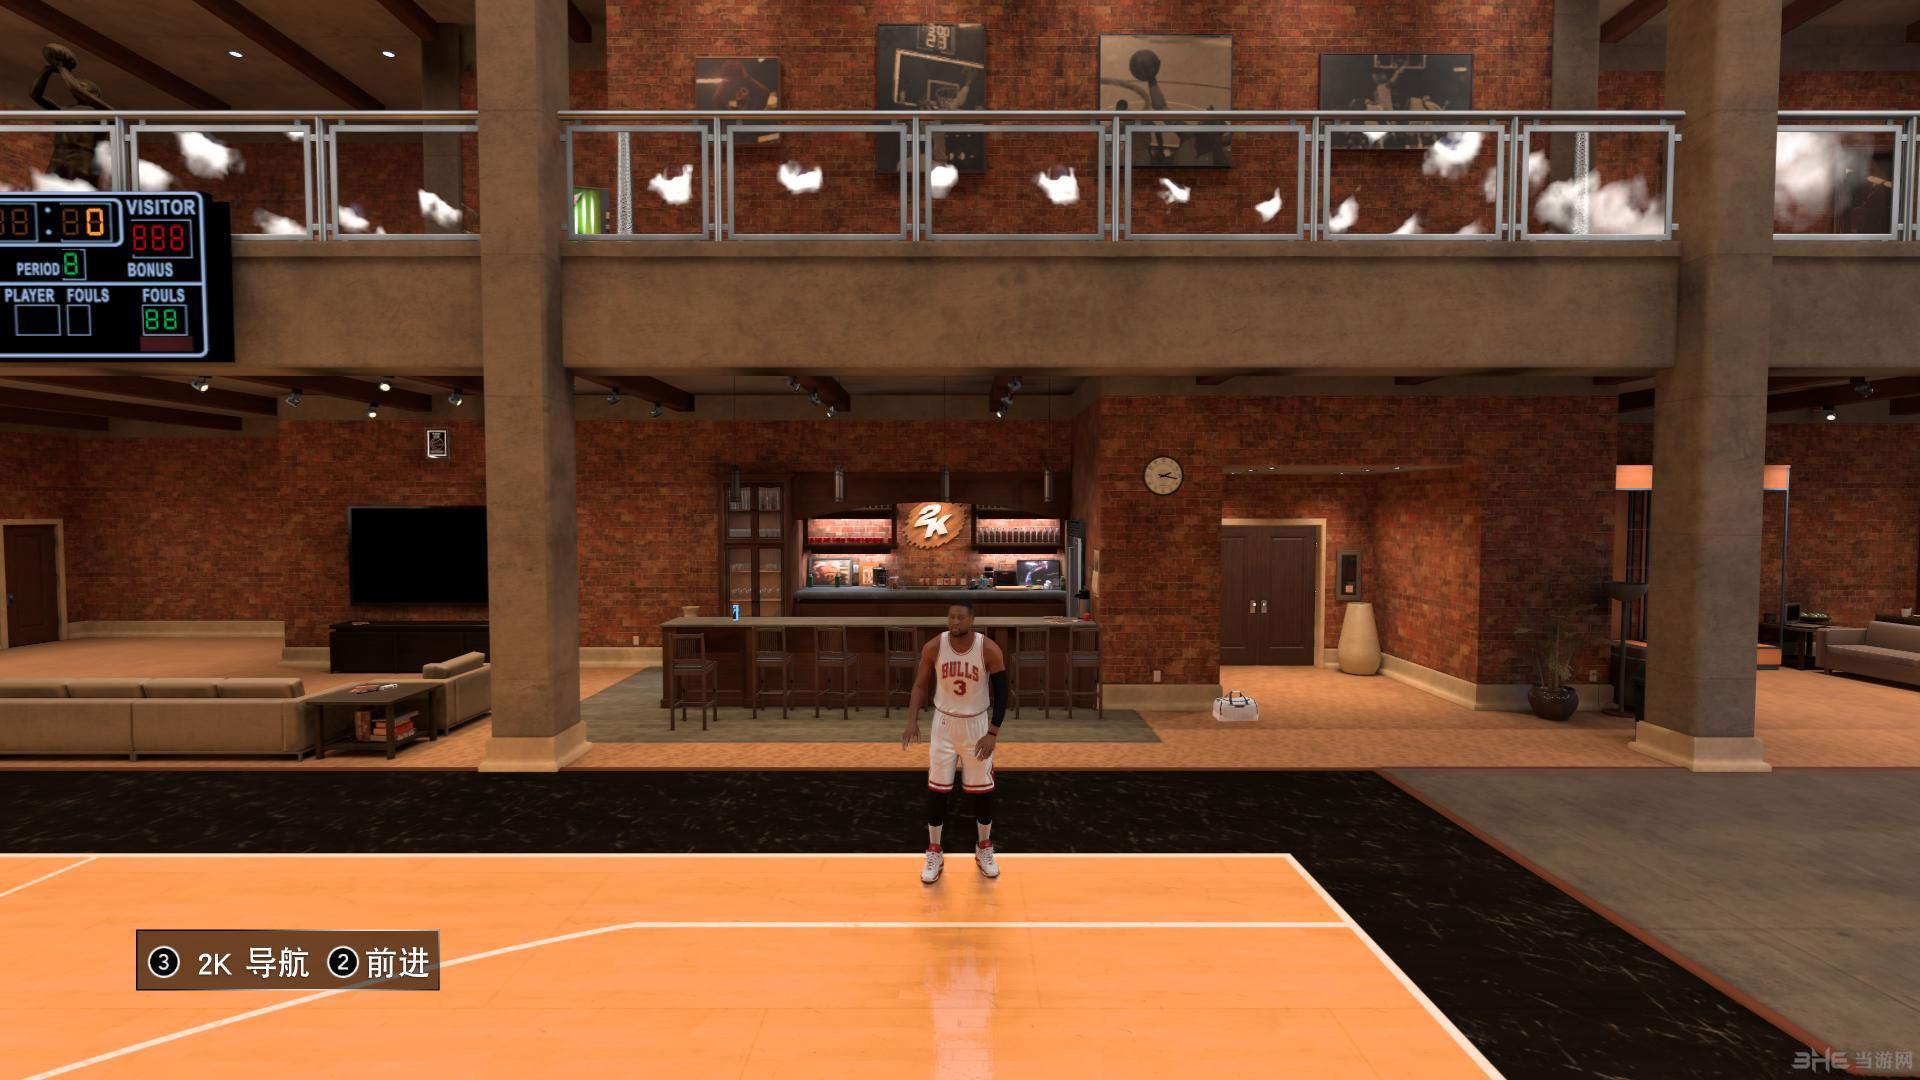 NBA 2K17威斯布鲁克韦德MC面补存档截图1